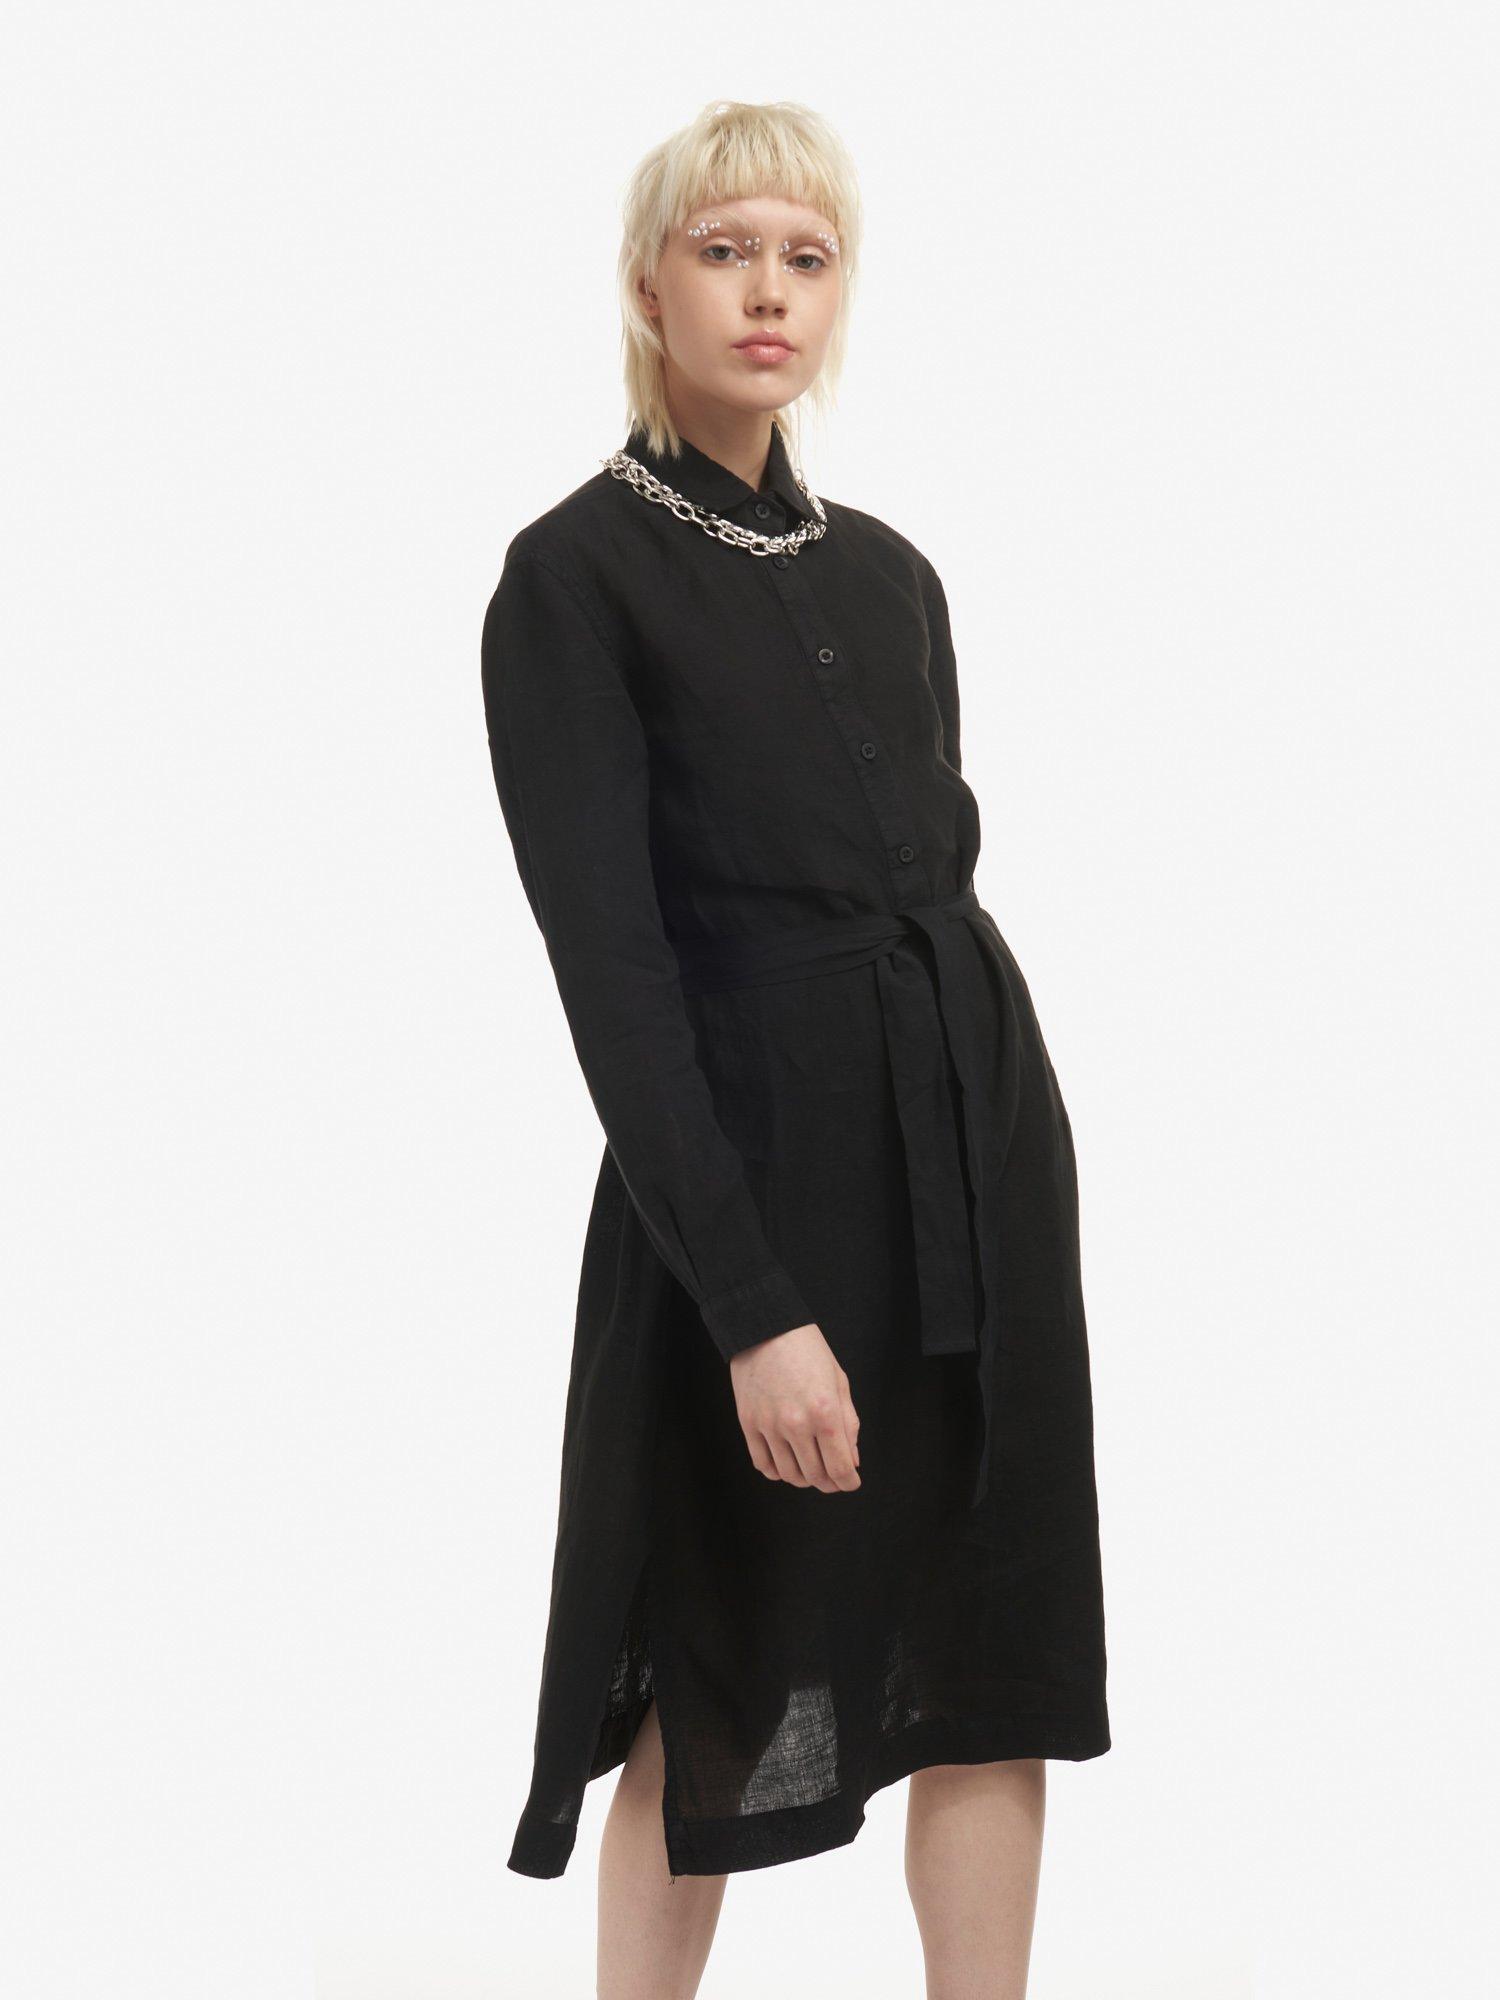 Blauer - LINEN DRESS - Black - Blauer